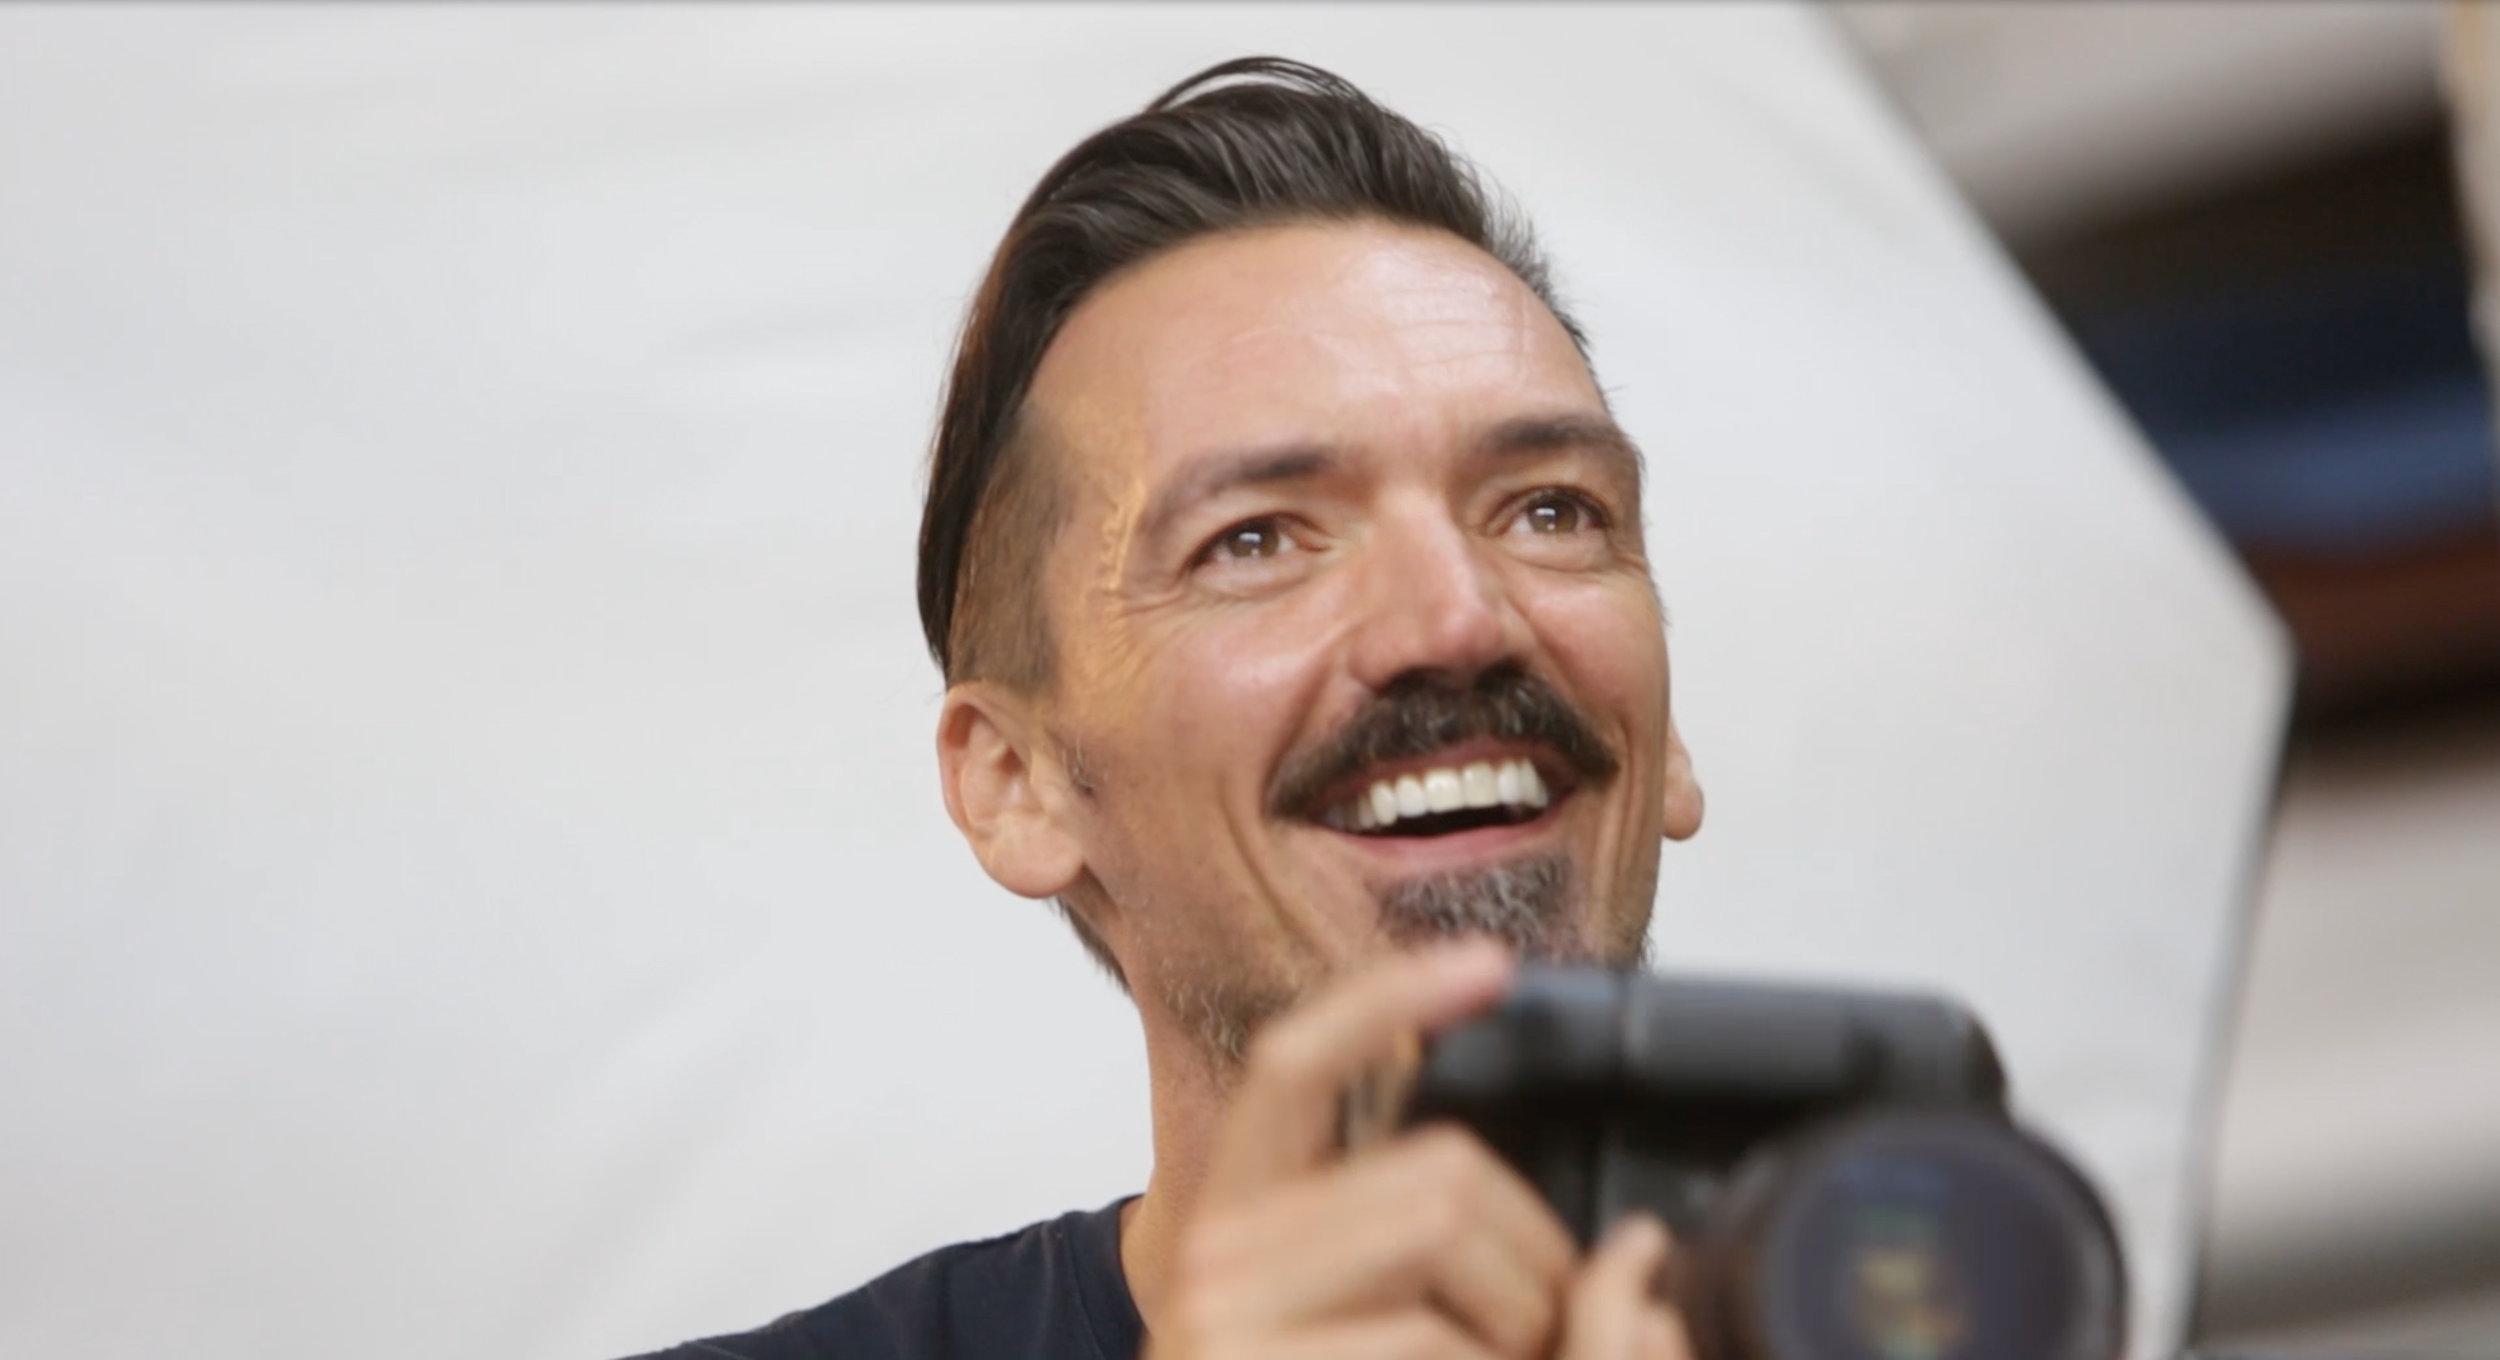 Shandon Youngclaus - Los Angeles Celebrity Headshot Photographer